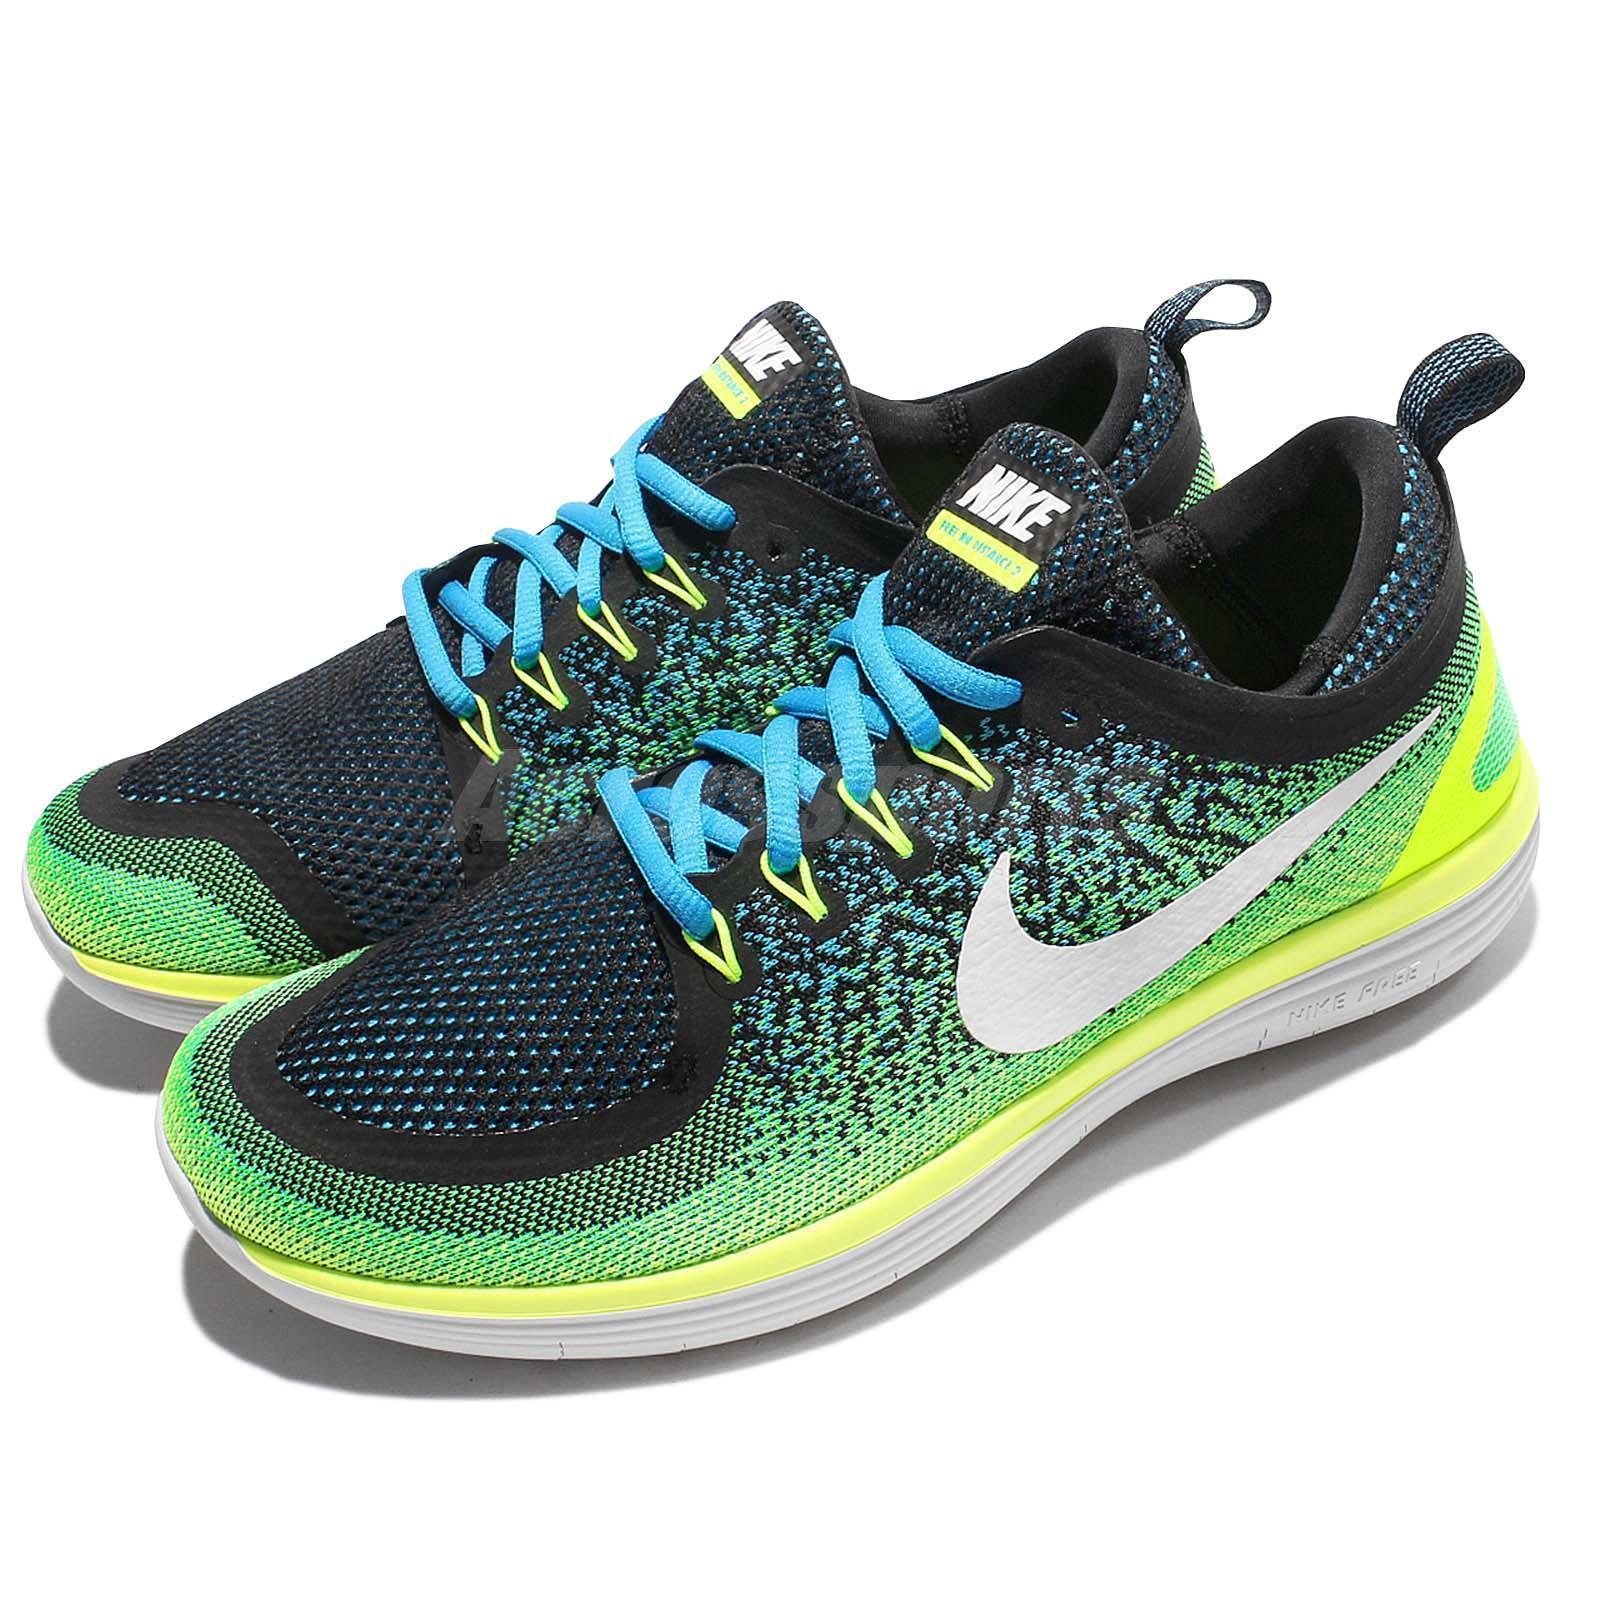 Nike Flex Experience Rn Sepatu Lari Pria Merah - Daftar Harga ... f8fb6fa6dd